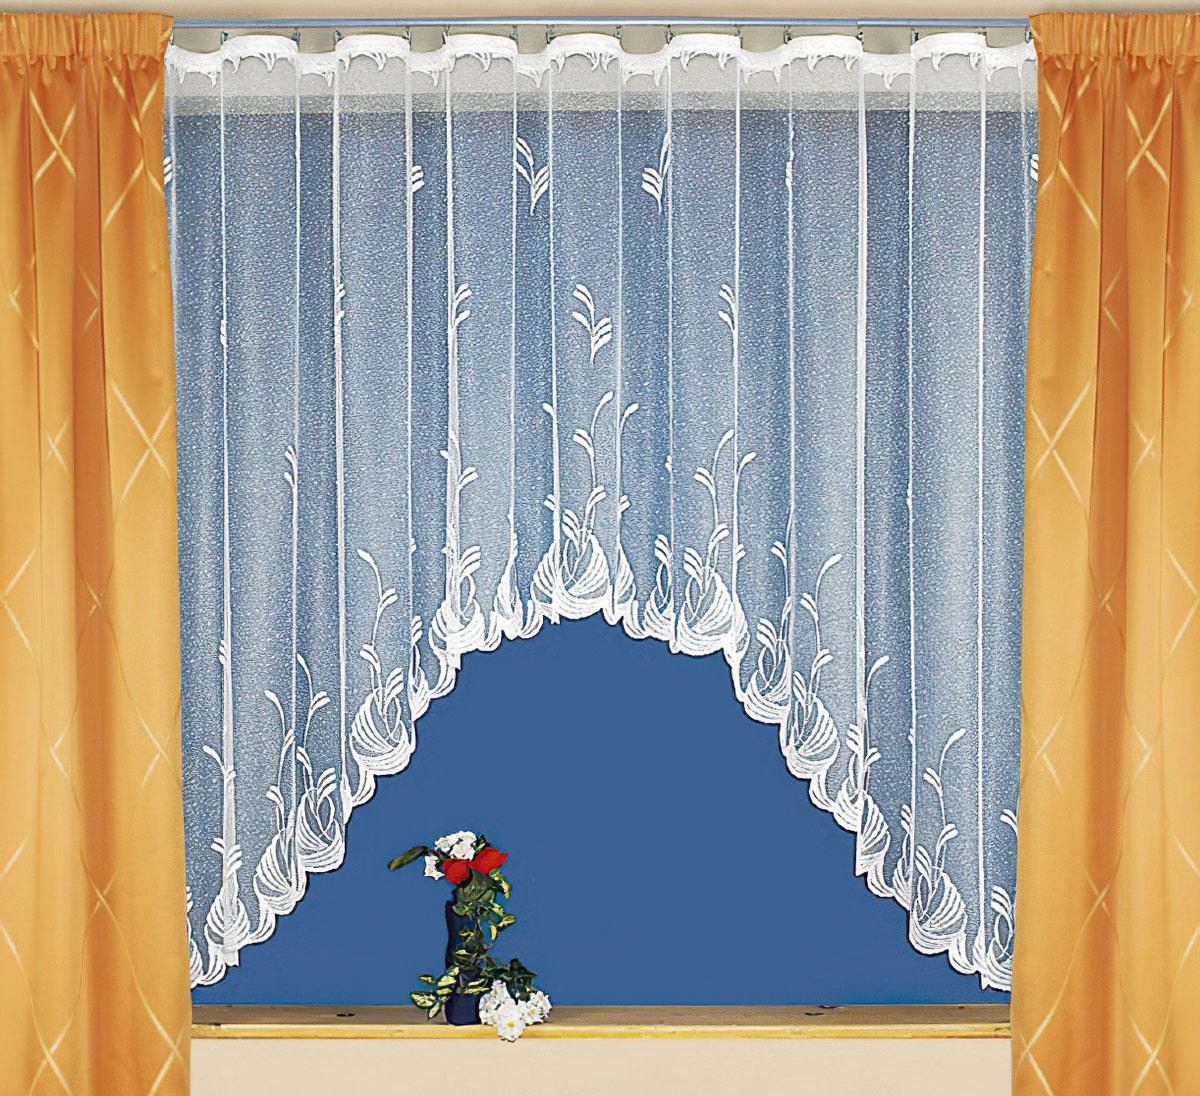 Tylex kusová záclona oblouková MARGOT jednobarevná bílá, v.120 cm x š.230 cm (na okno)